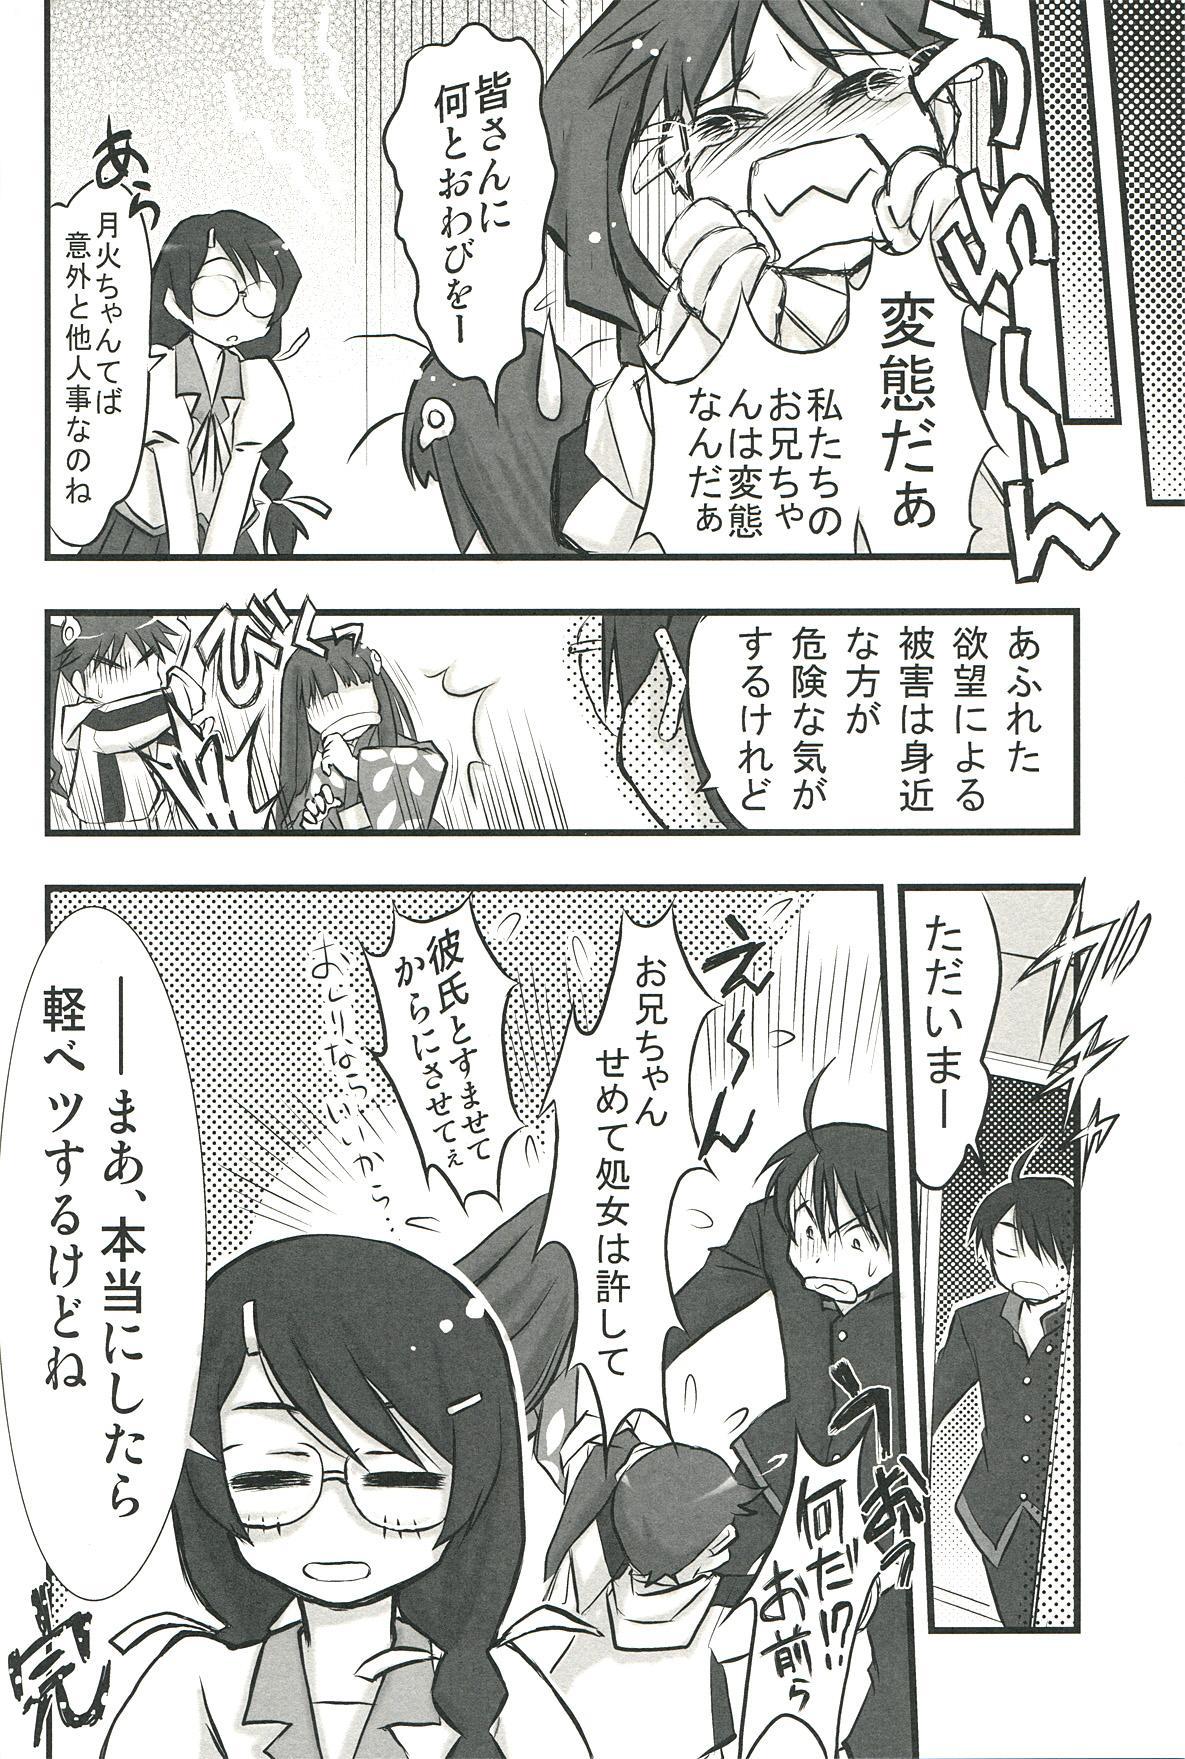 Emonogatari 63